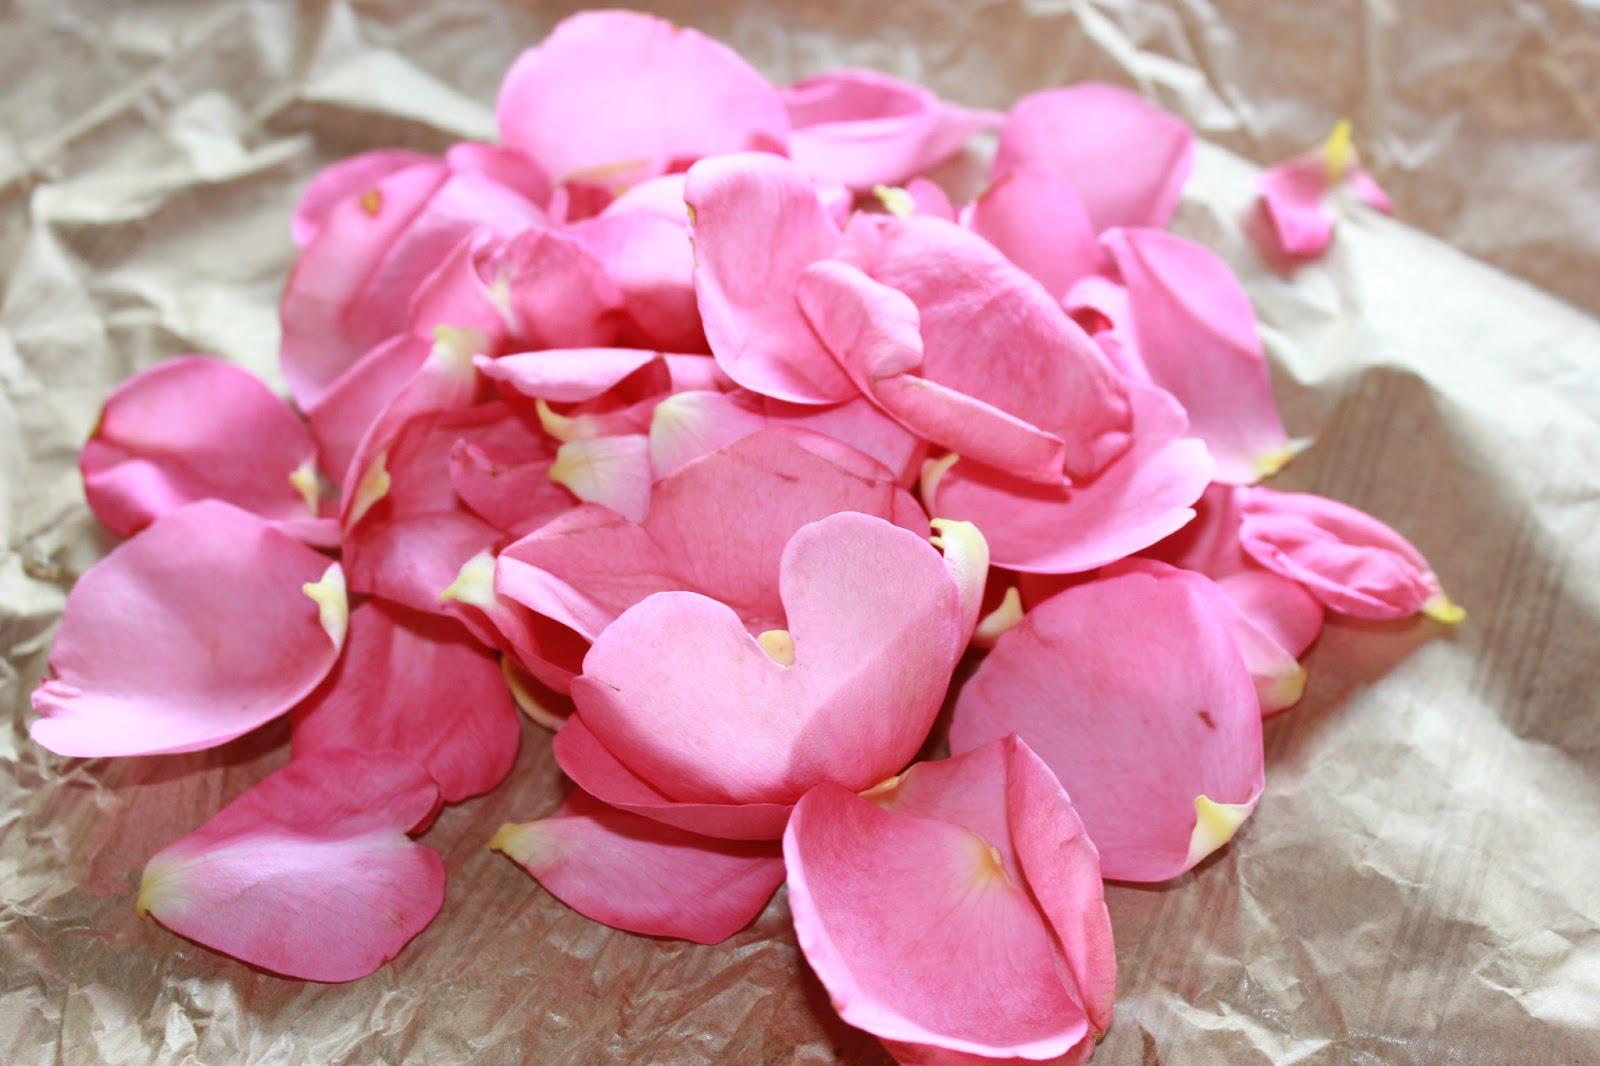 Cuill re et saladier p tales de rose cristallis s - Petales de roses sechees ...